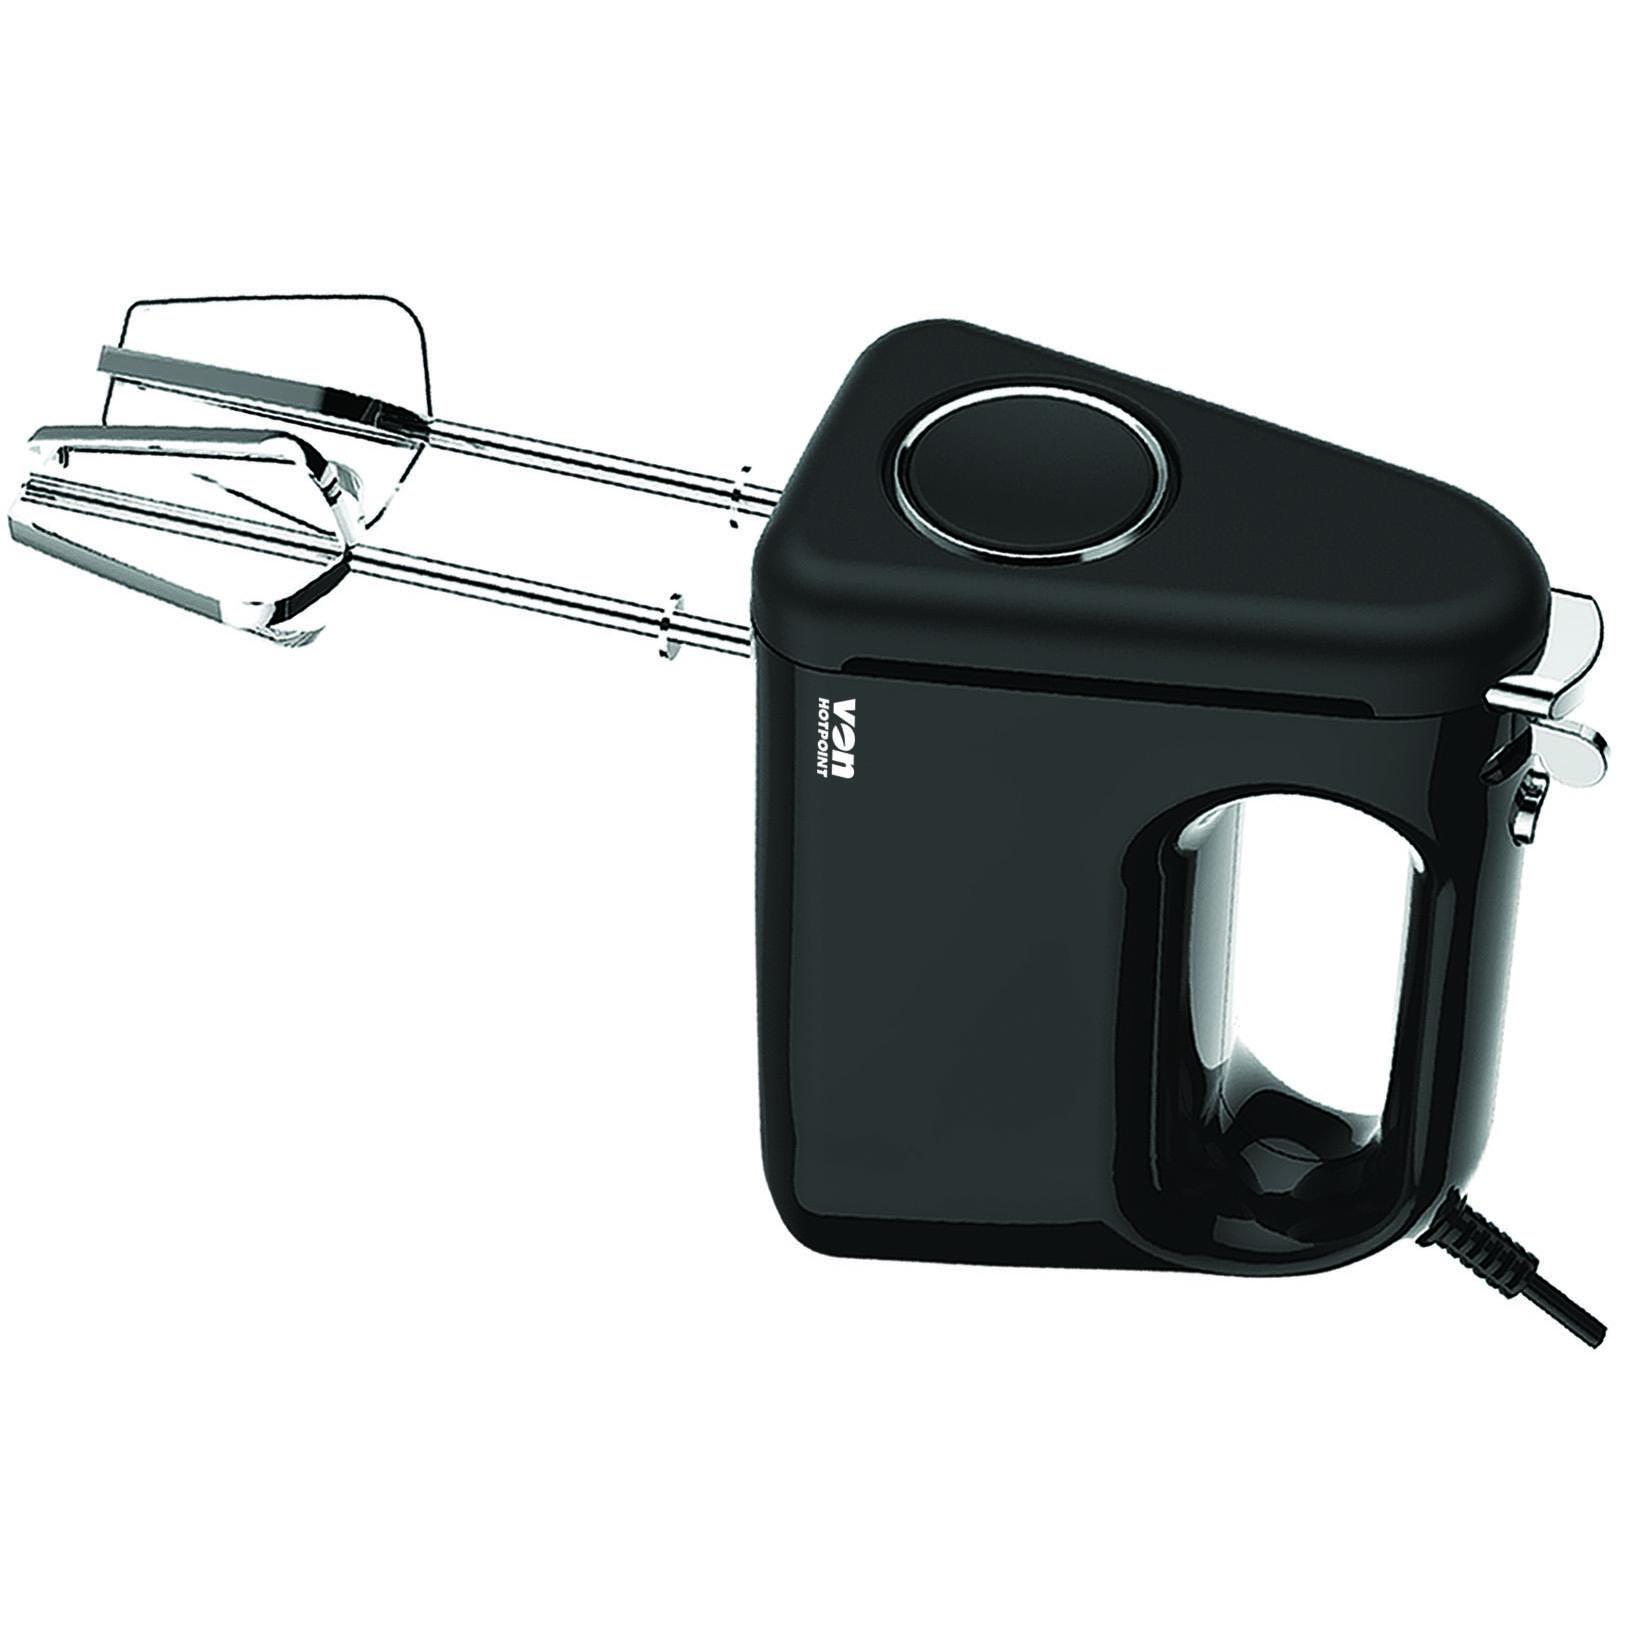 Elites Age Supermarket- small kitchen appliances, electric hand mixer